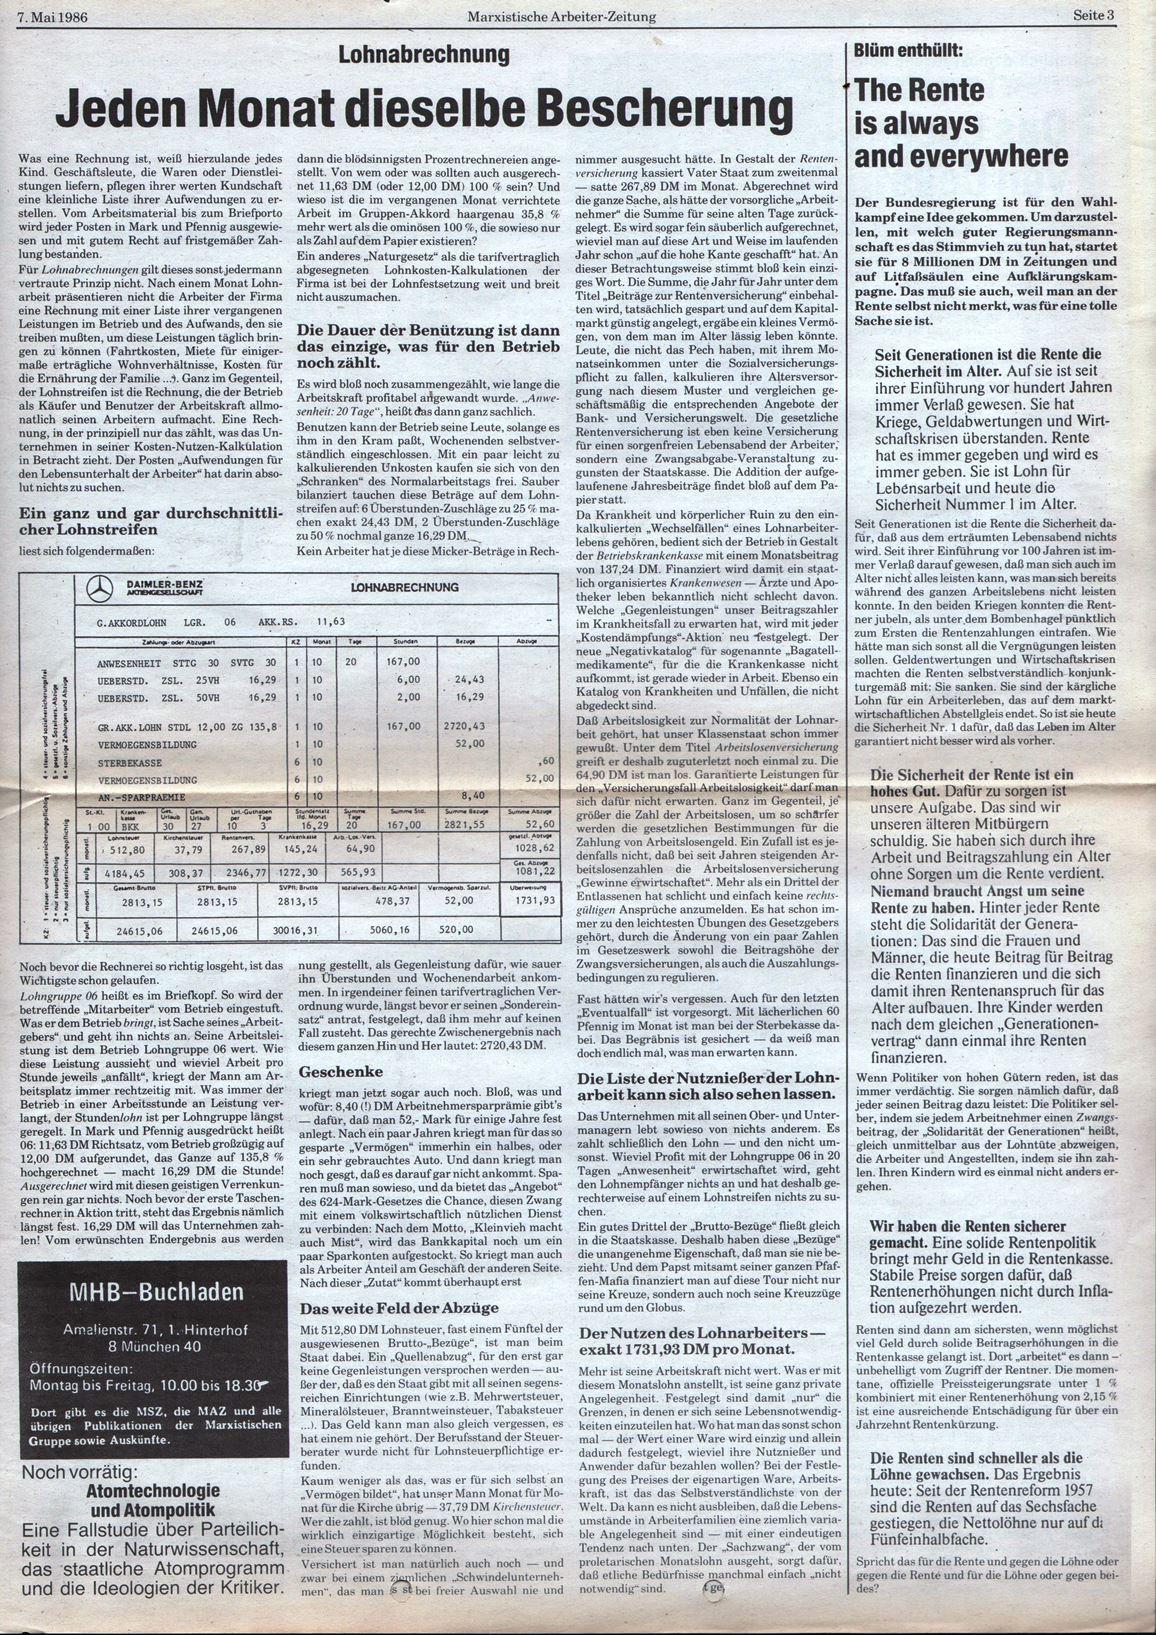 Muenchen_MG_MAZ_Kaufhaus_19860507_03